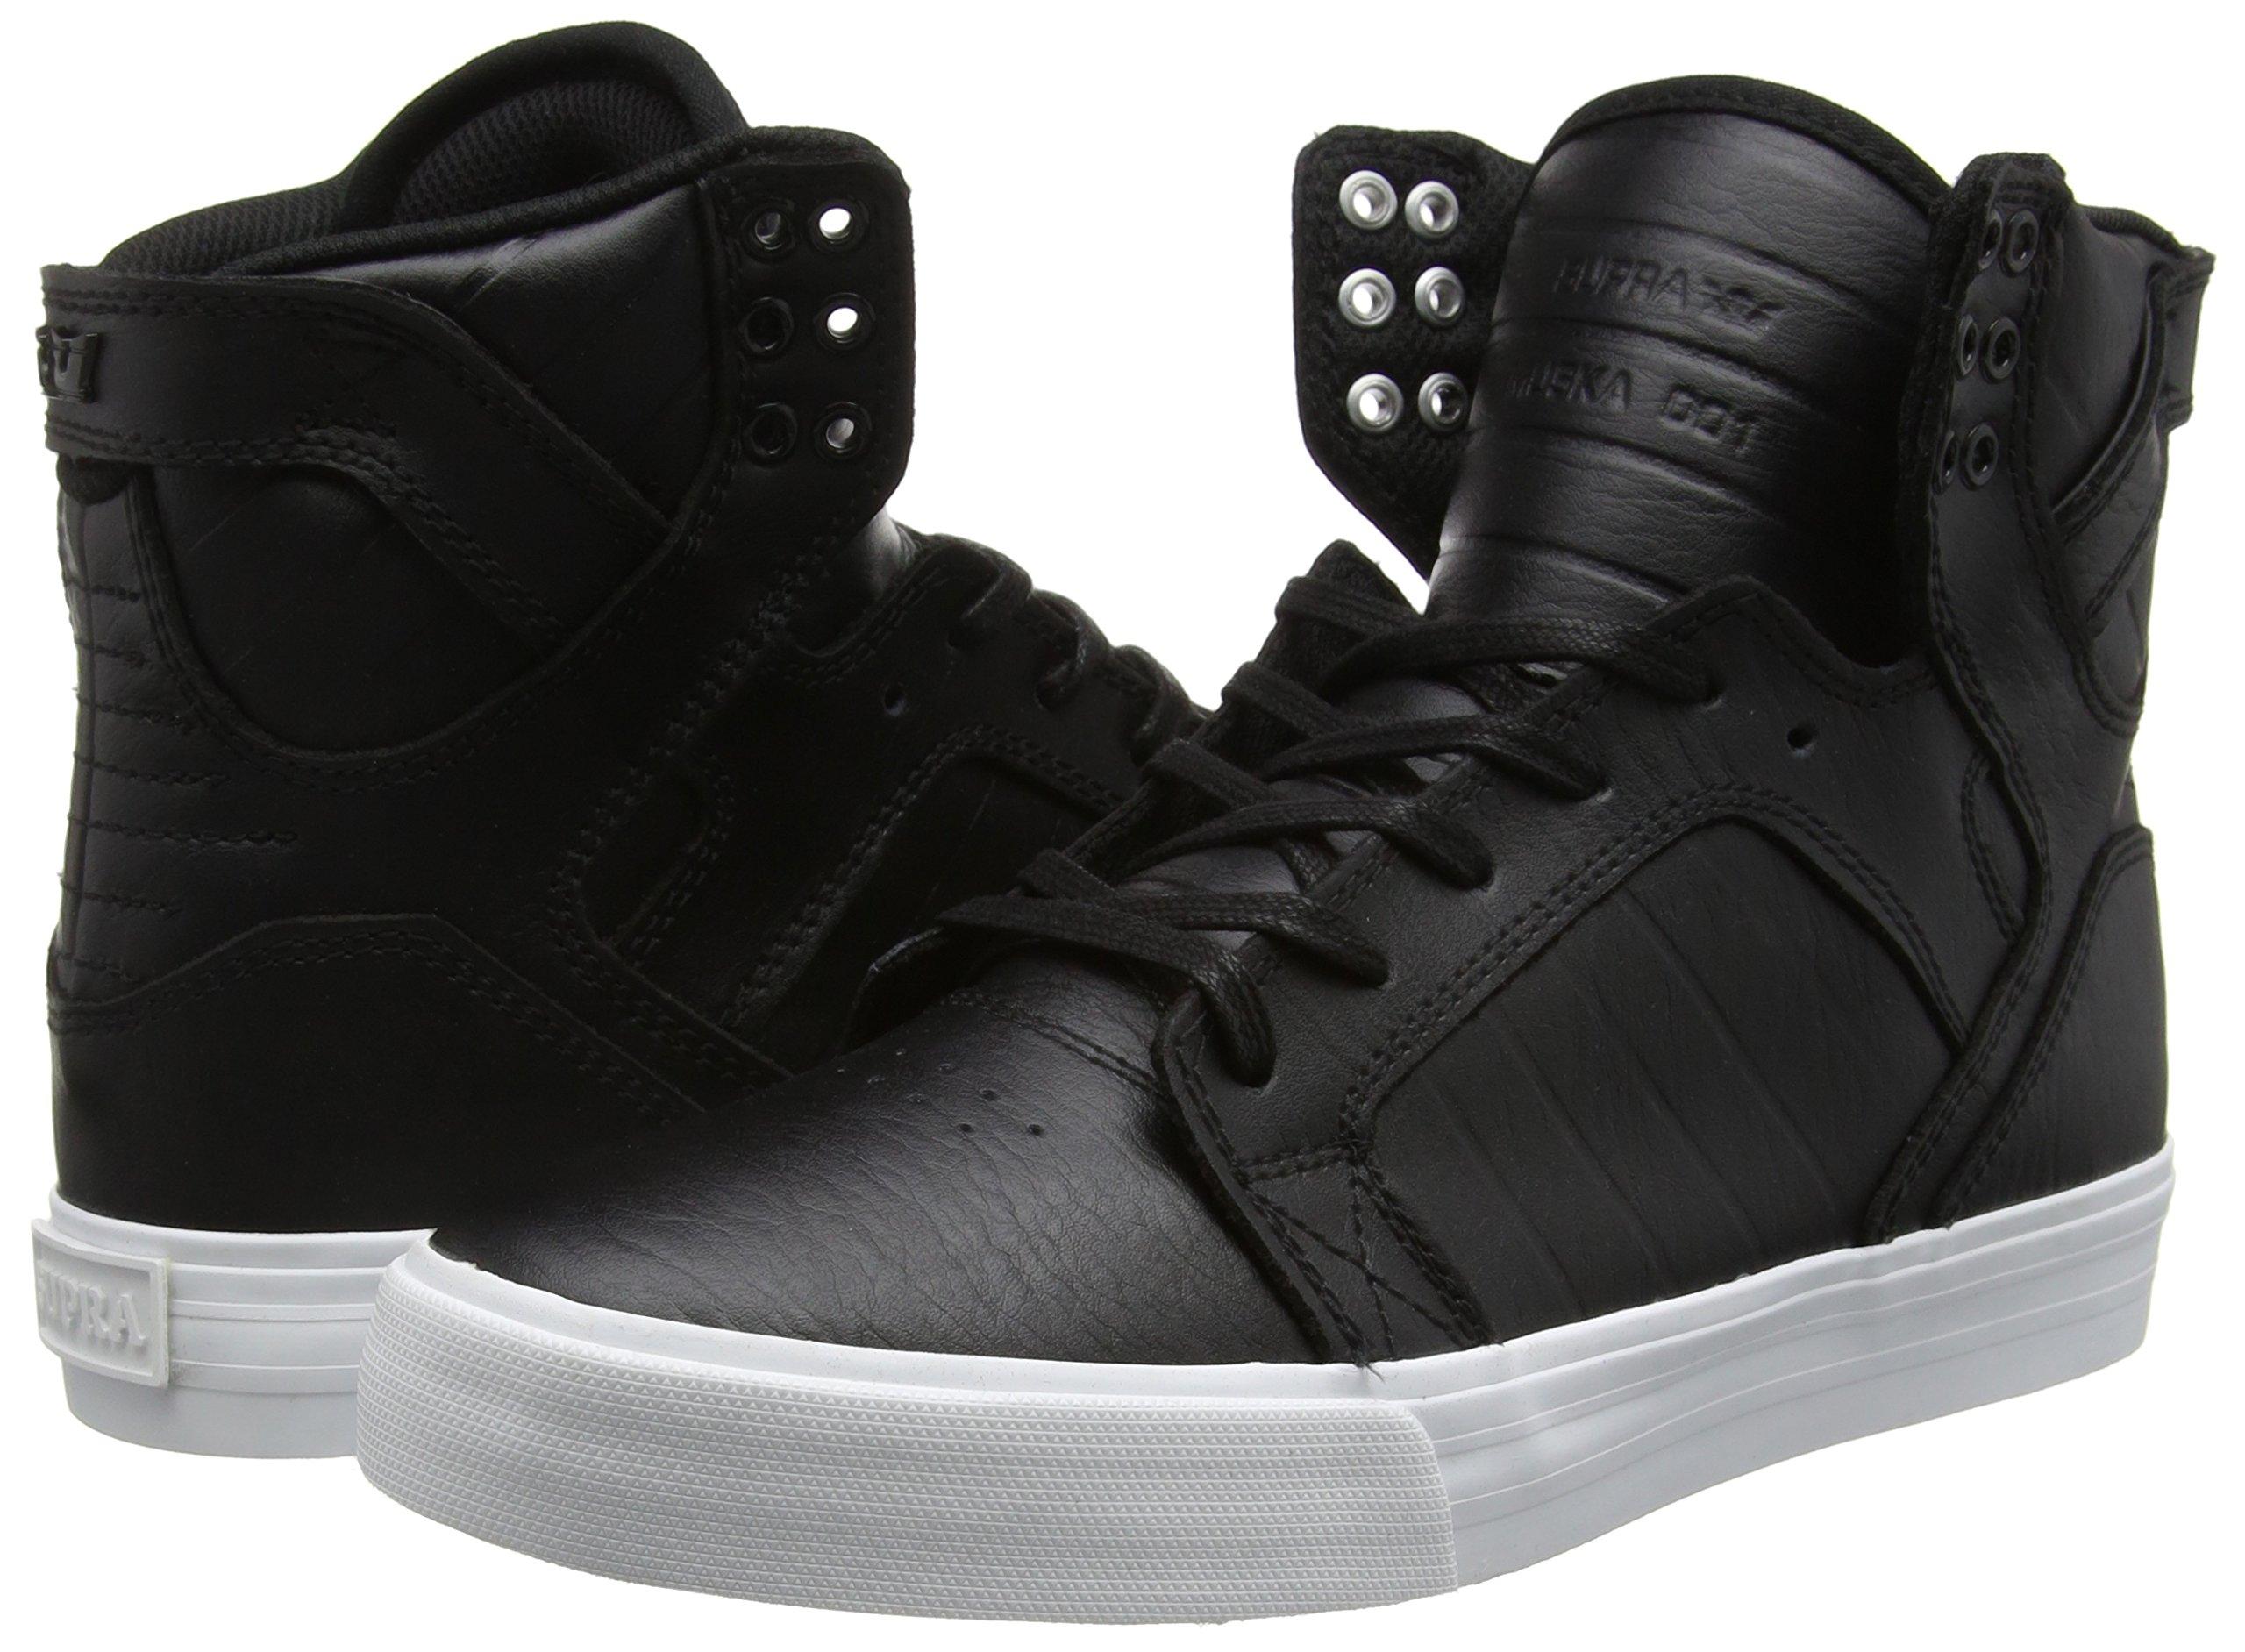 Supra Skytop Skate Shoe, Black/White, 5.5 Regular US by Supra (Image #5)